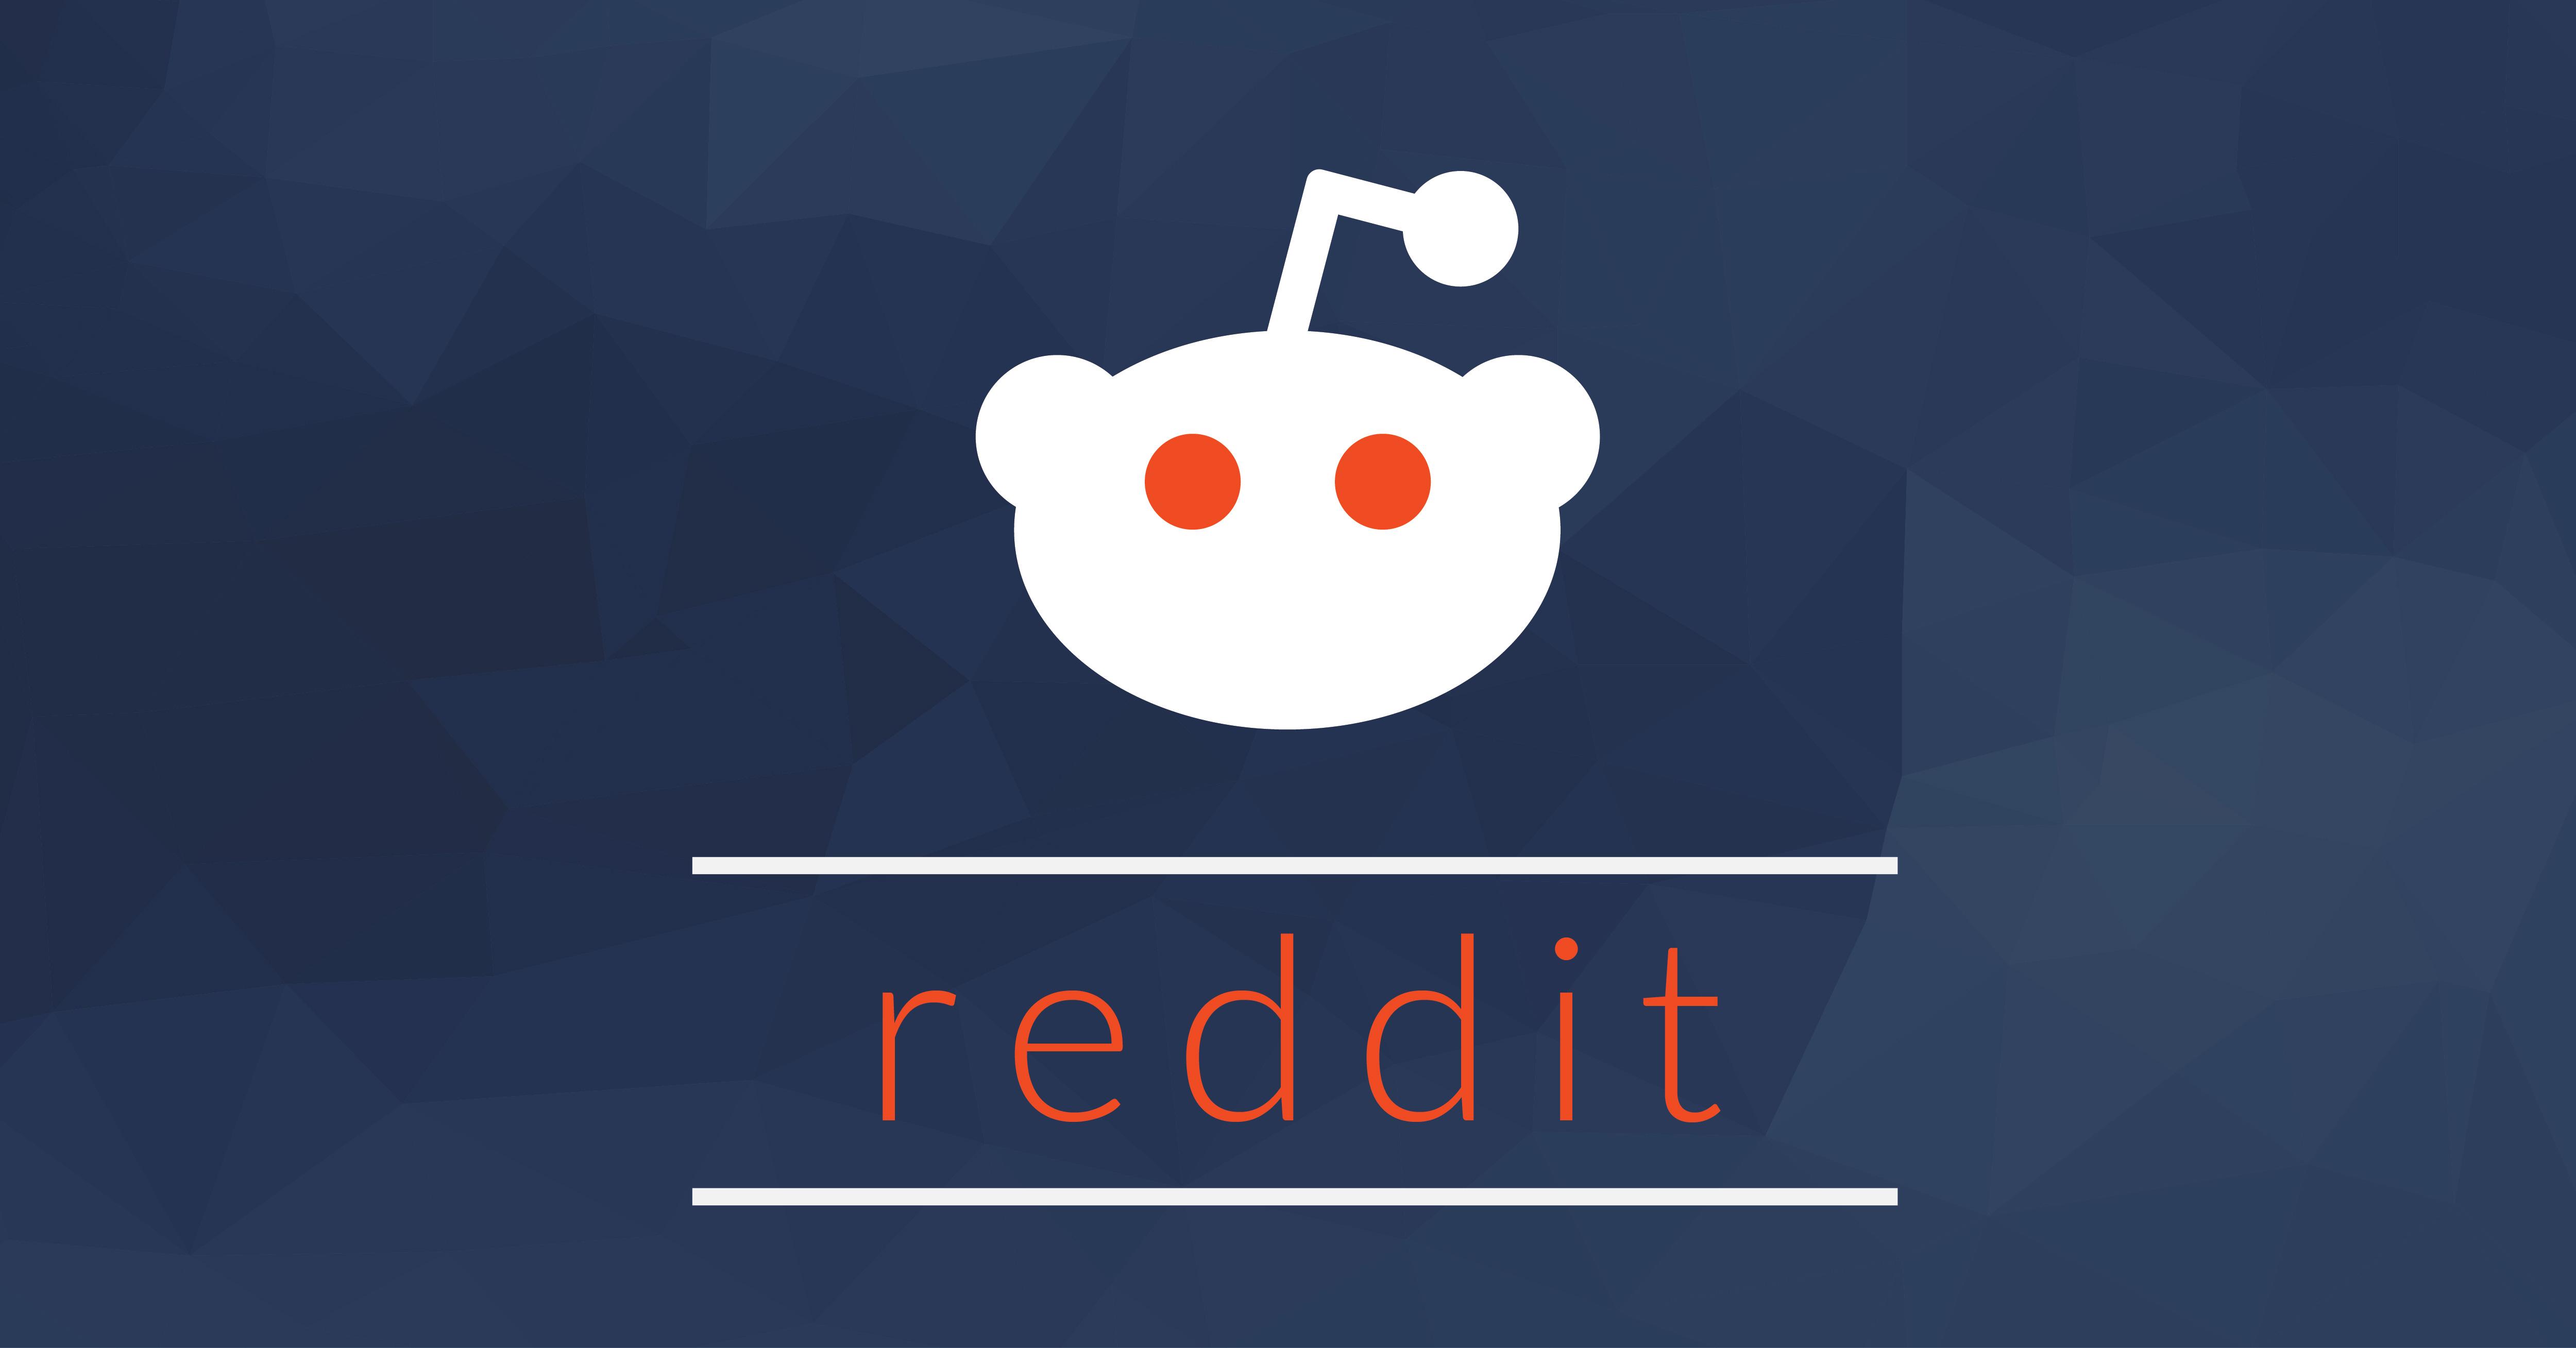 Reddit logo 5k hd logo 4k wallpapers images - Android wallpaper reddit ...